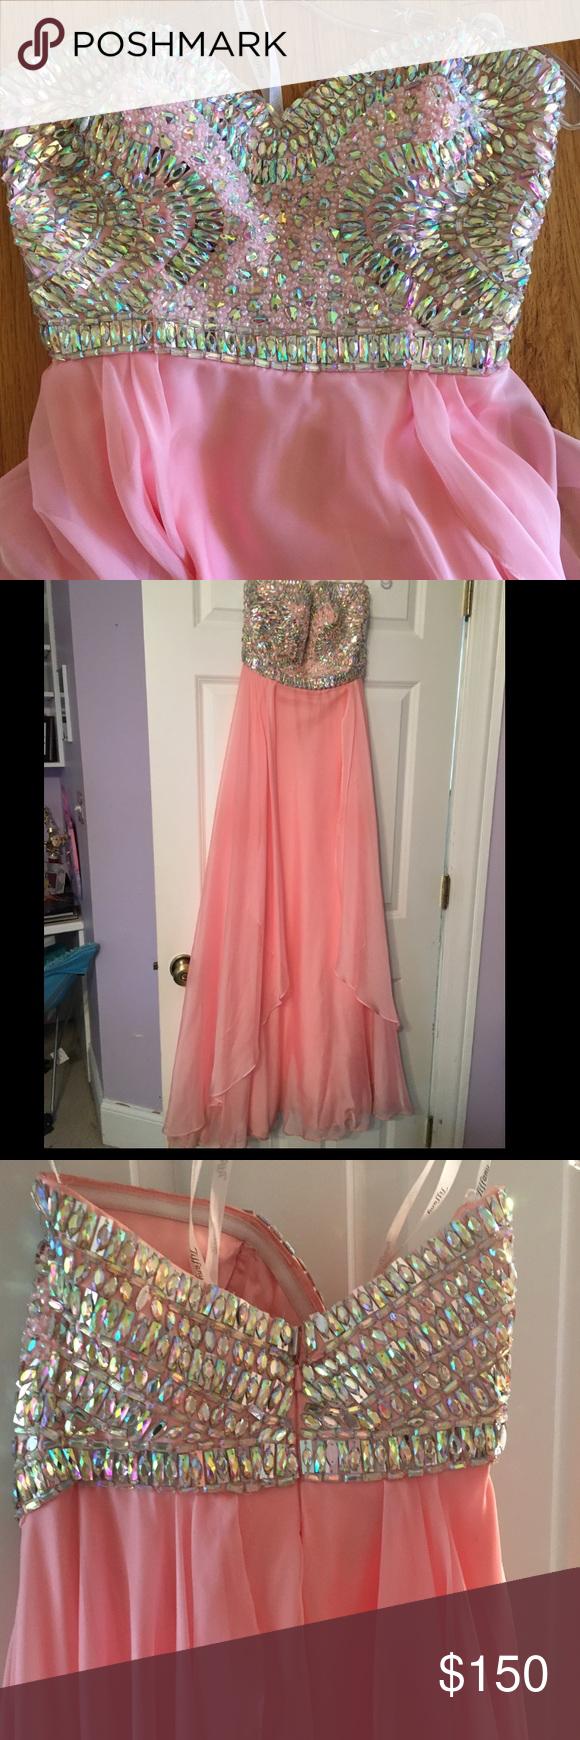 Light pink prom dress tiffany dresses size and prom